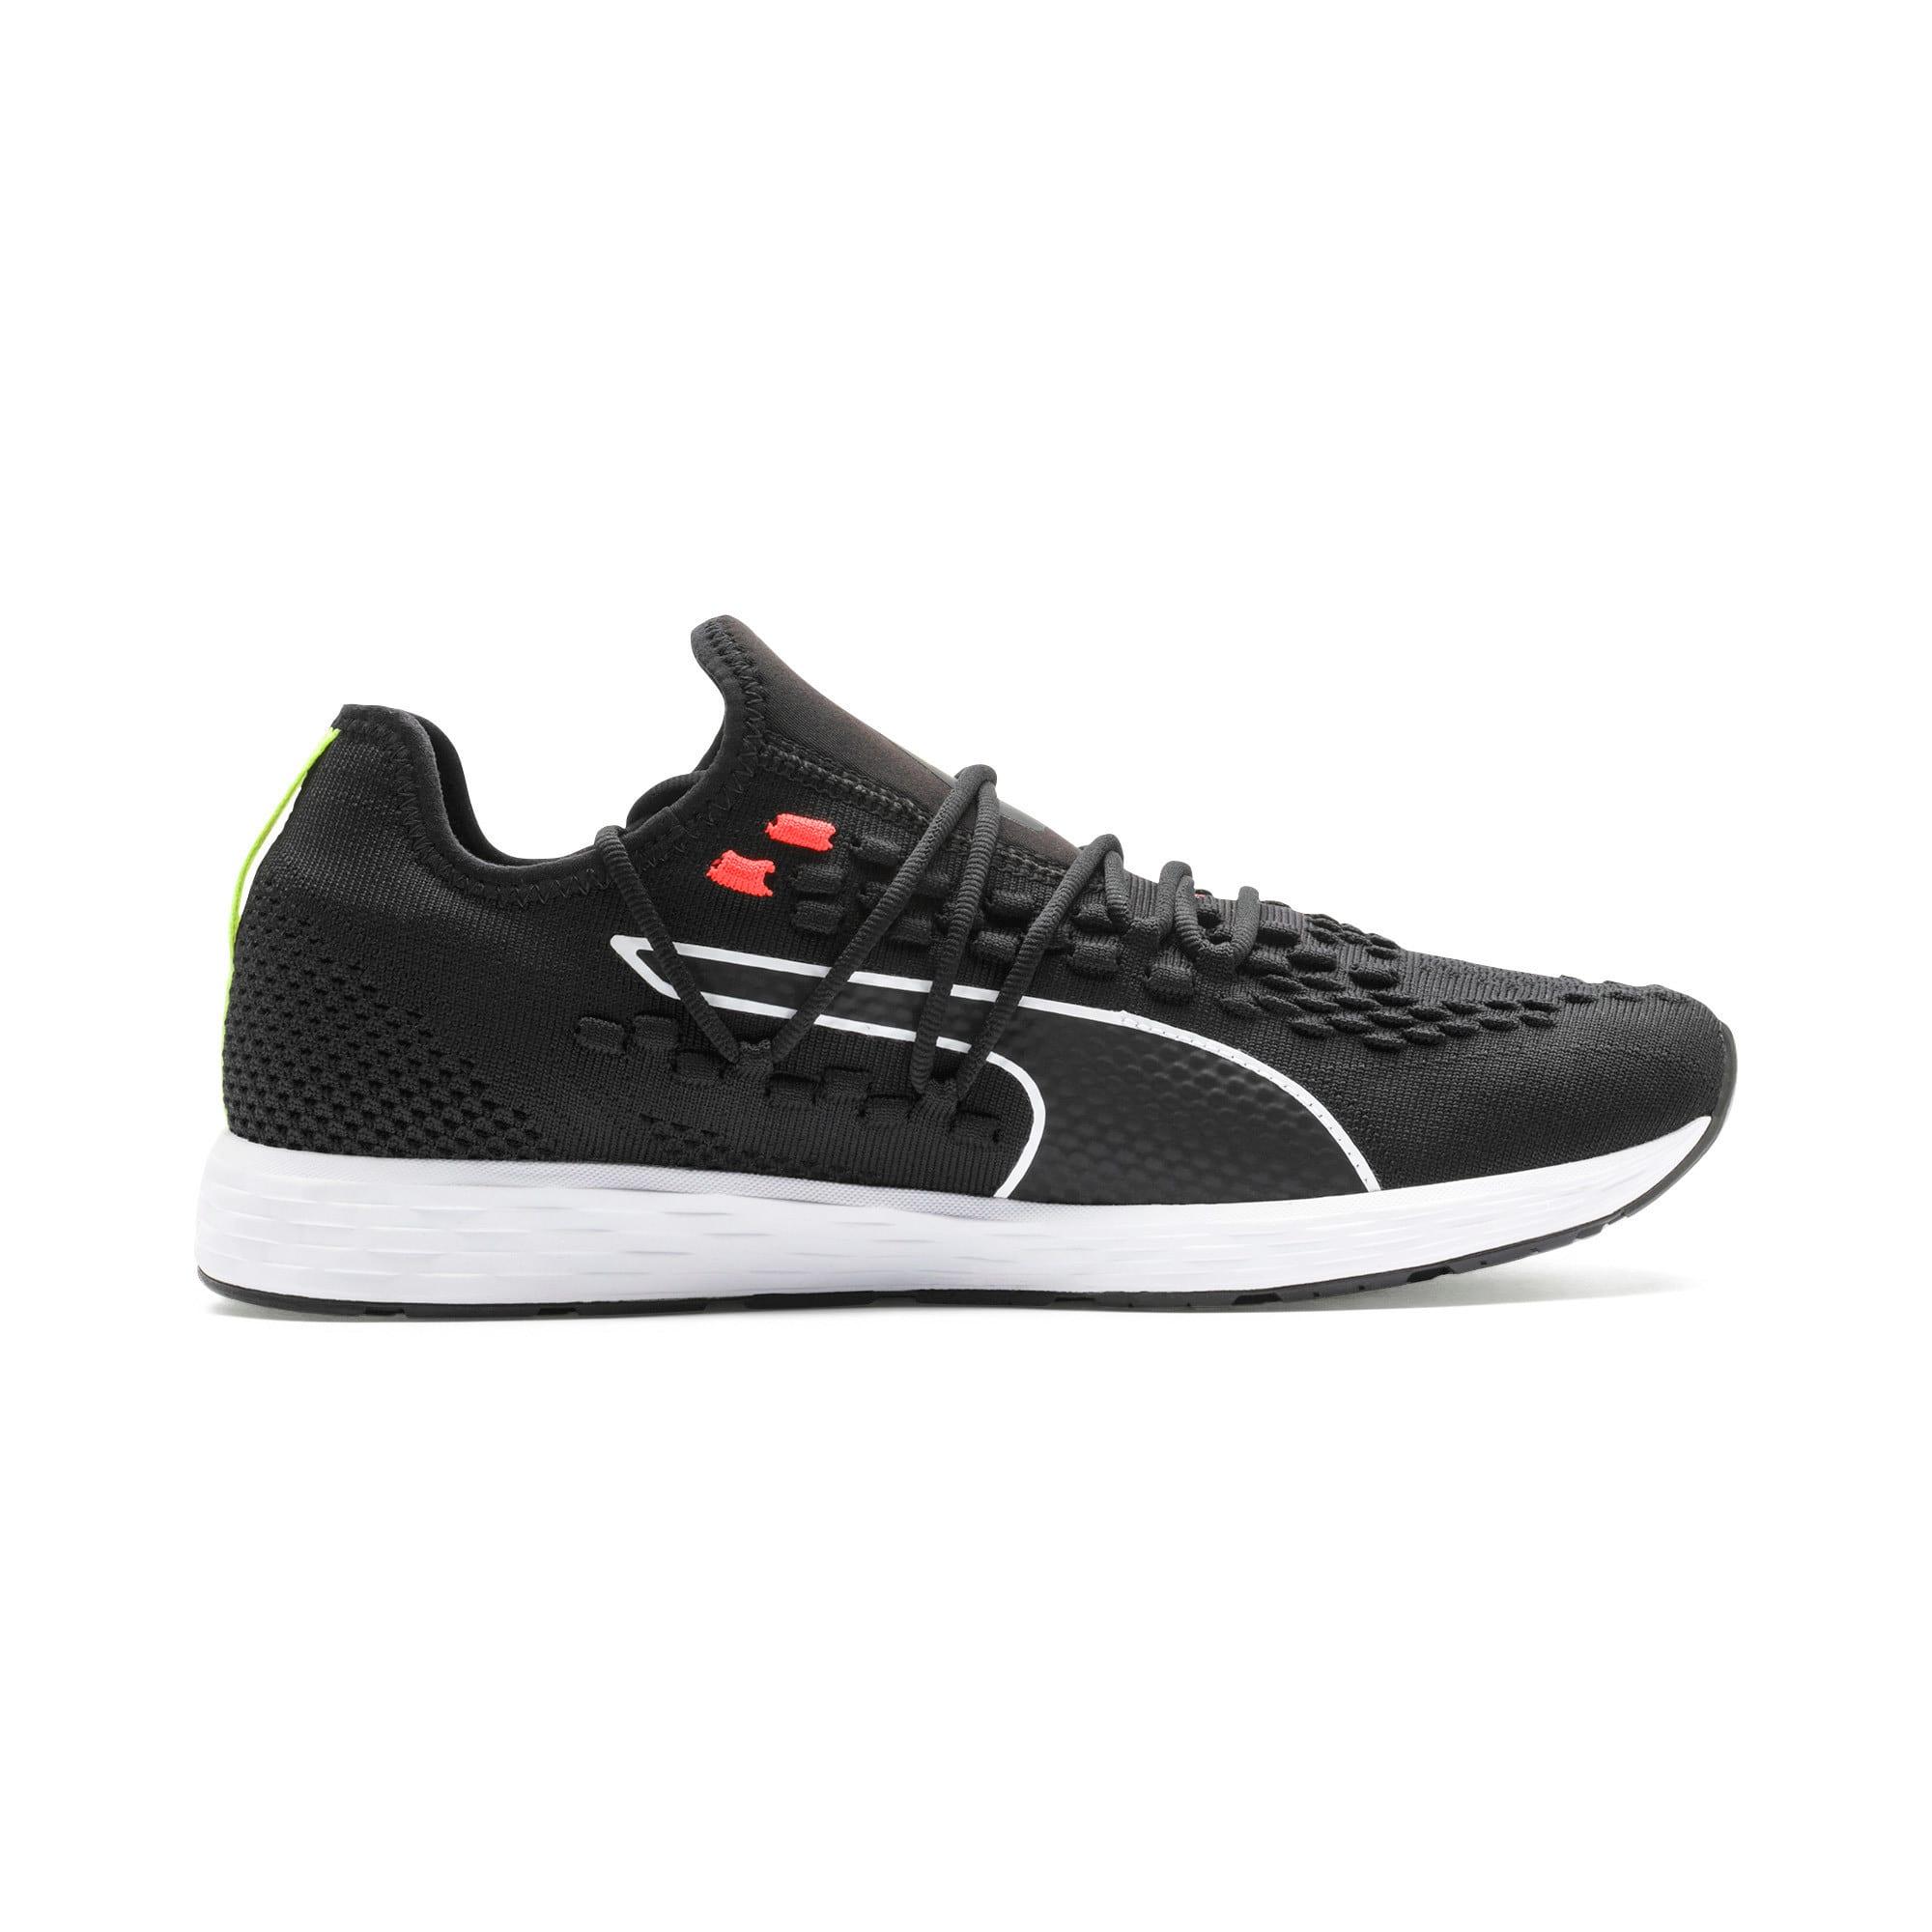 Thumbnail 6 of SPEED RACER Running Shoes, Black-Nrgy Red-Yellow Alert, medium